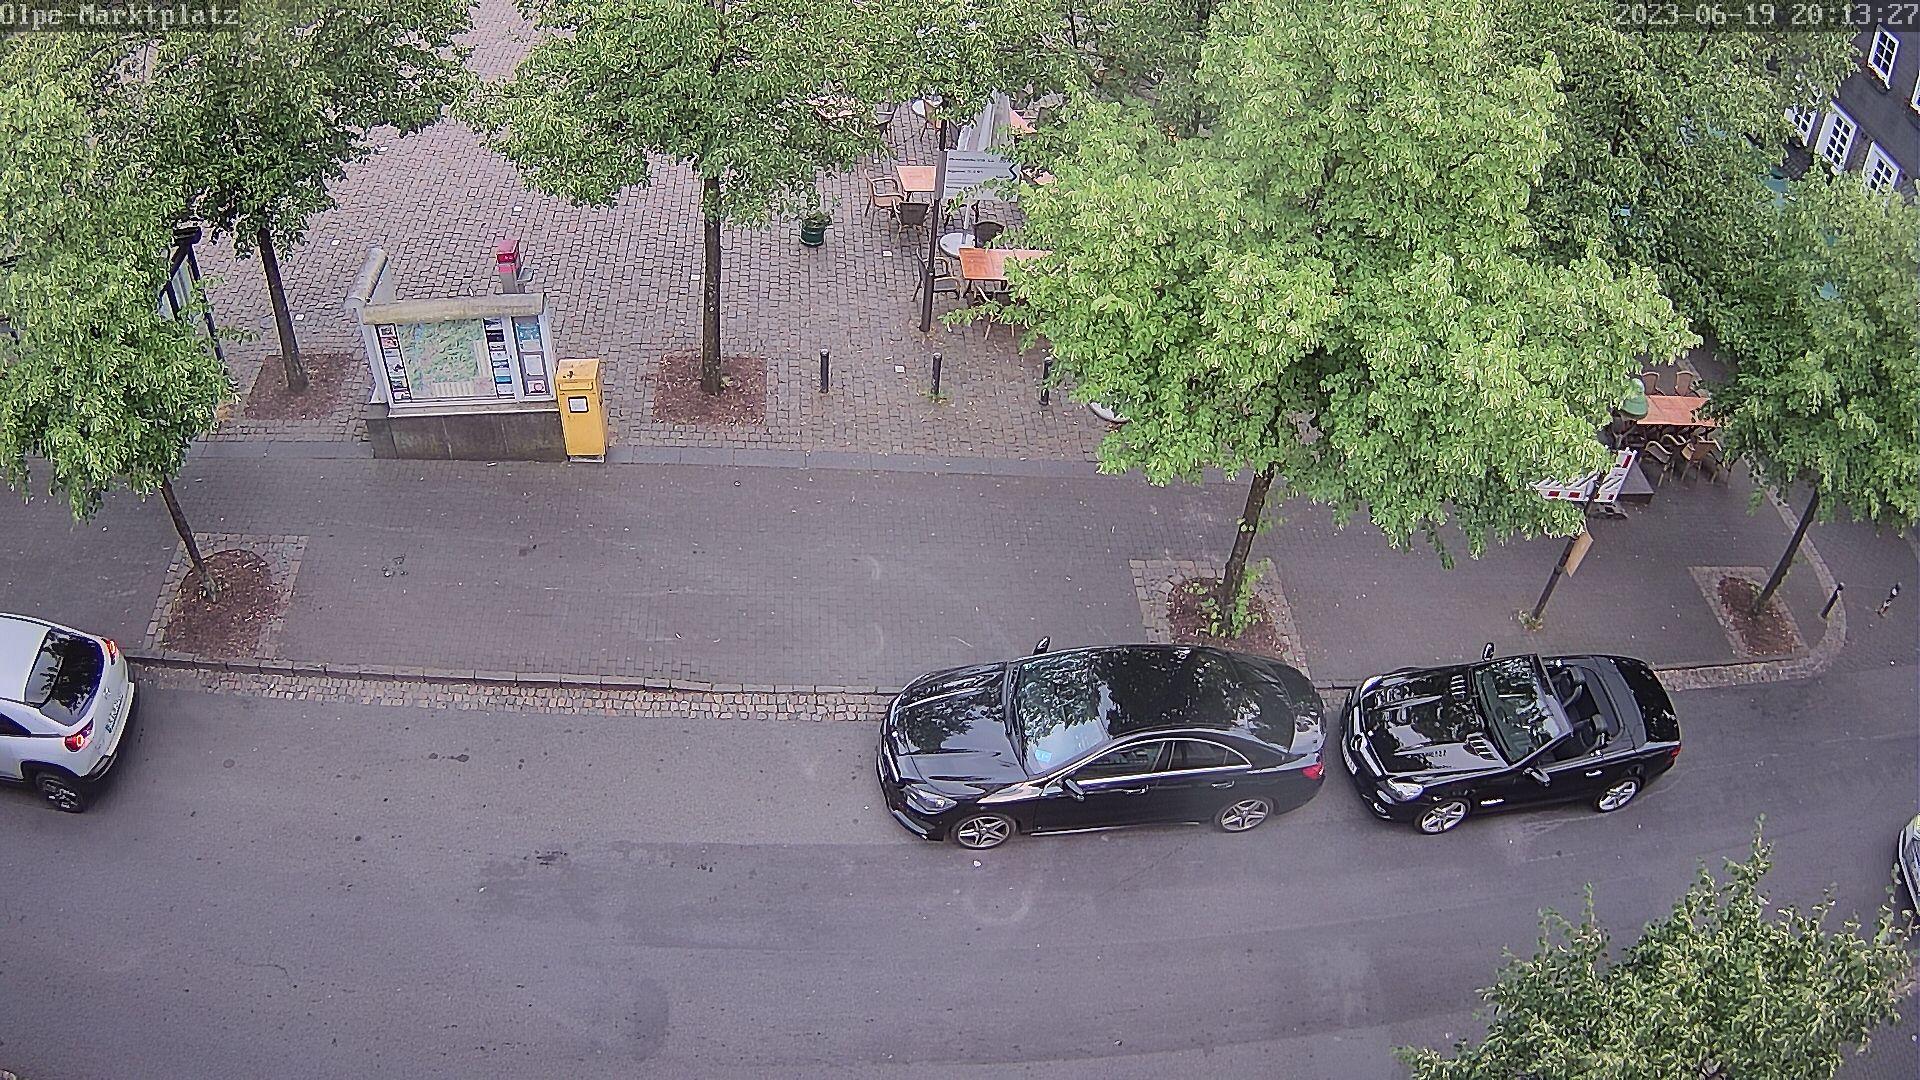 Webcam Marktplatz Olpe